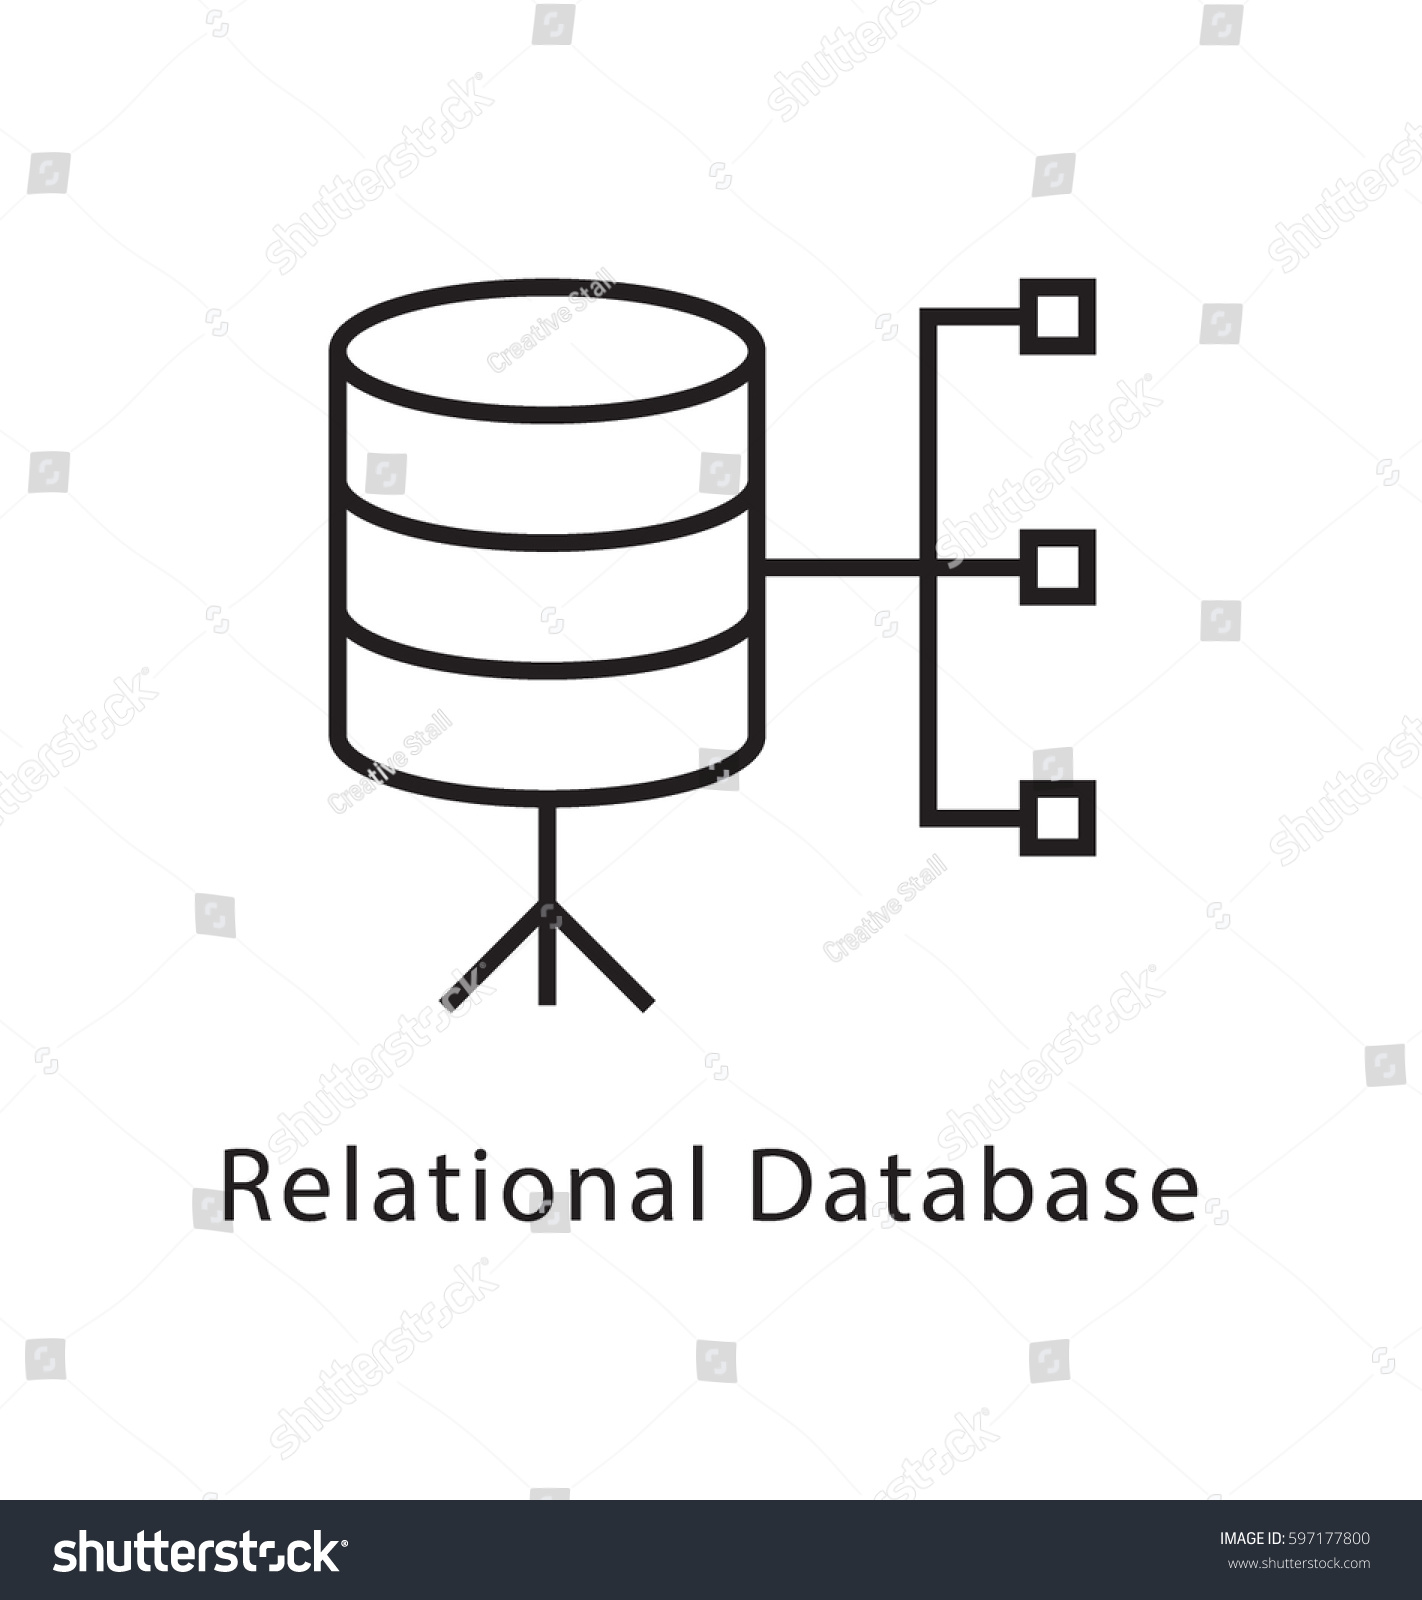 Relational database vector line icon stock vector 597177800 relational database vector line icon ccuart Images